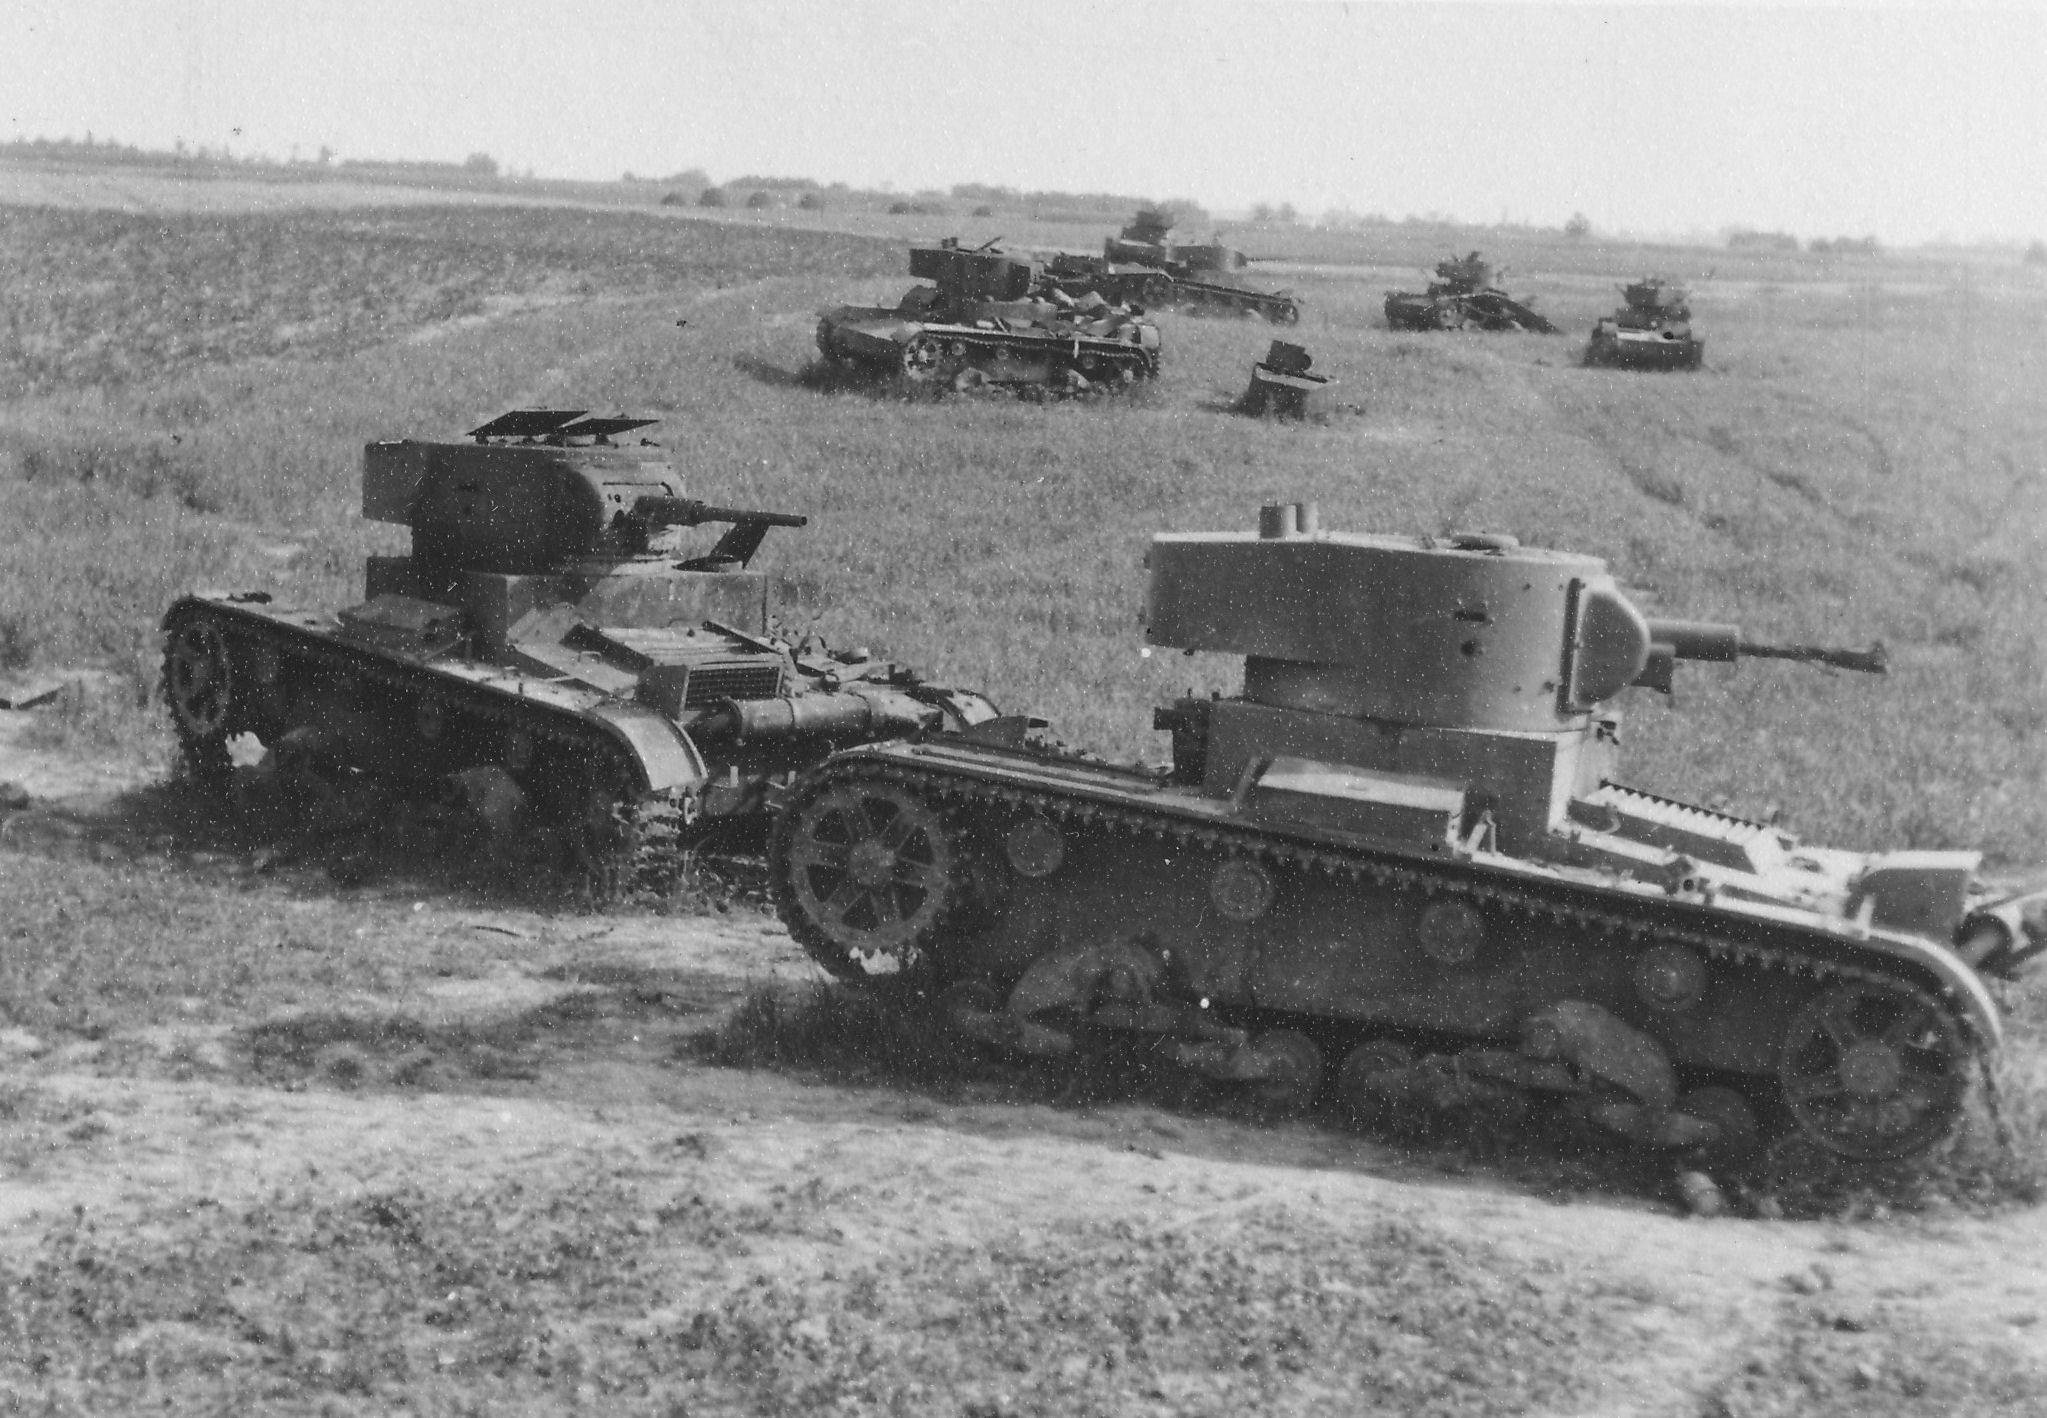 Destroyed_19th_tank_division_near_Vojnitsa-Lutsk_highway